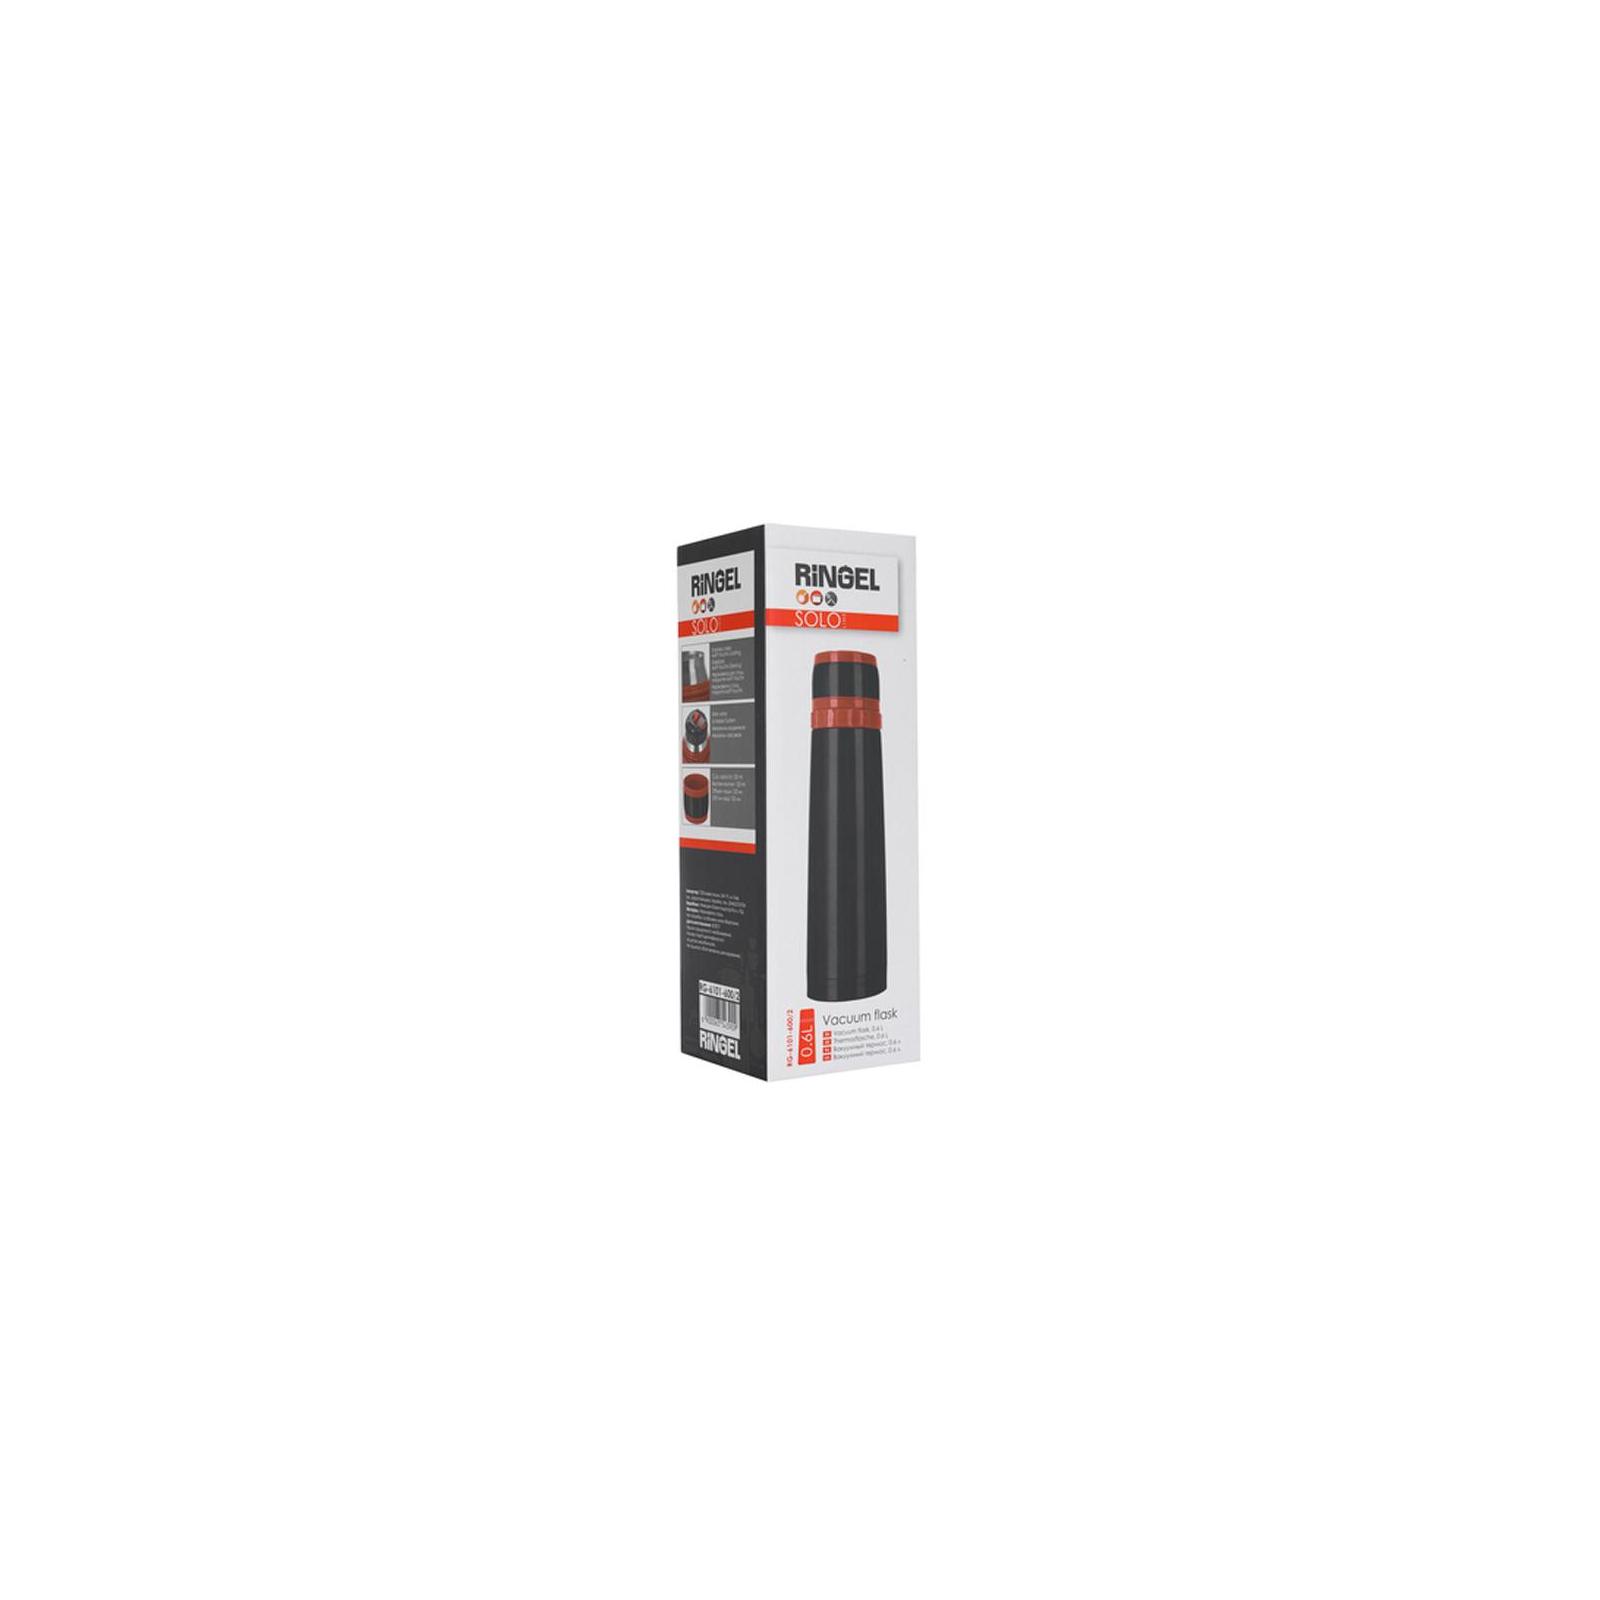 Термос Ringel Solo 0.4 L Black (RG-6101-400/2) изображение 7